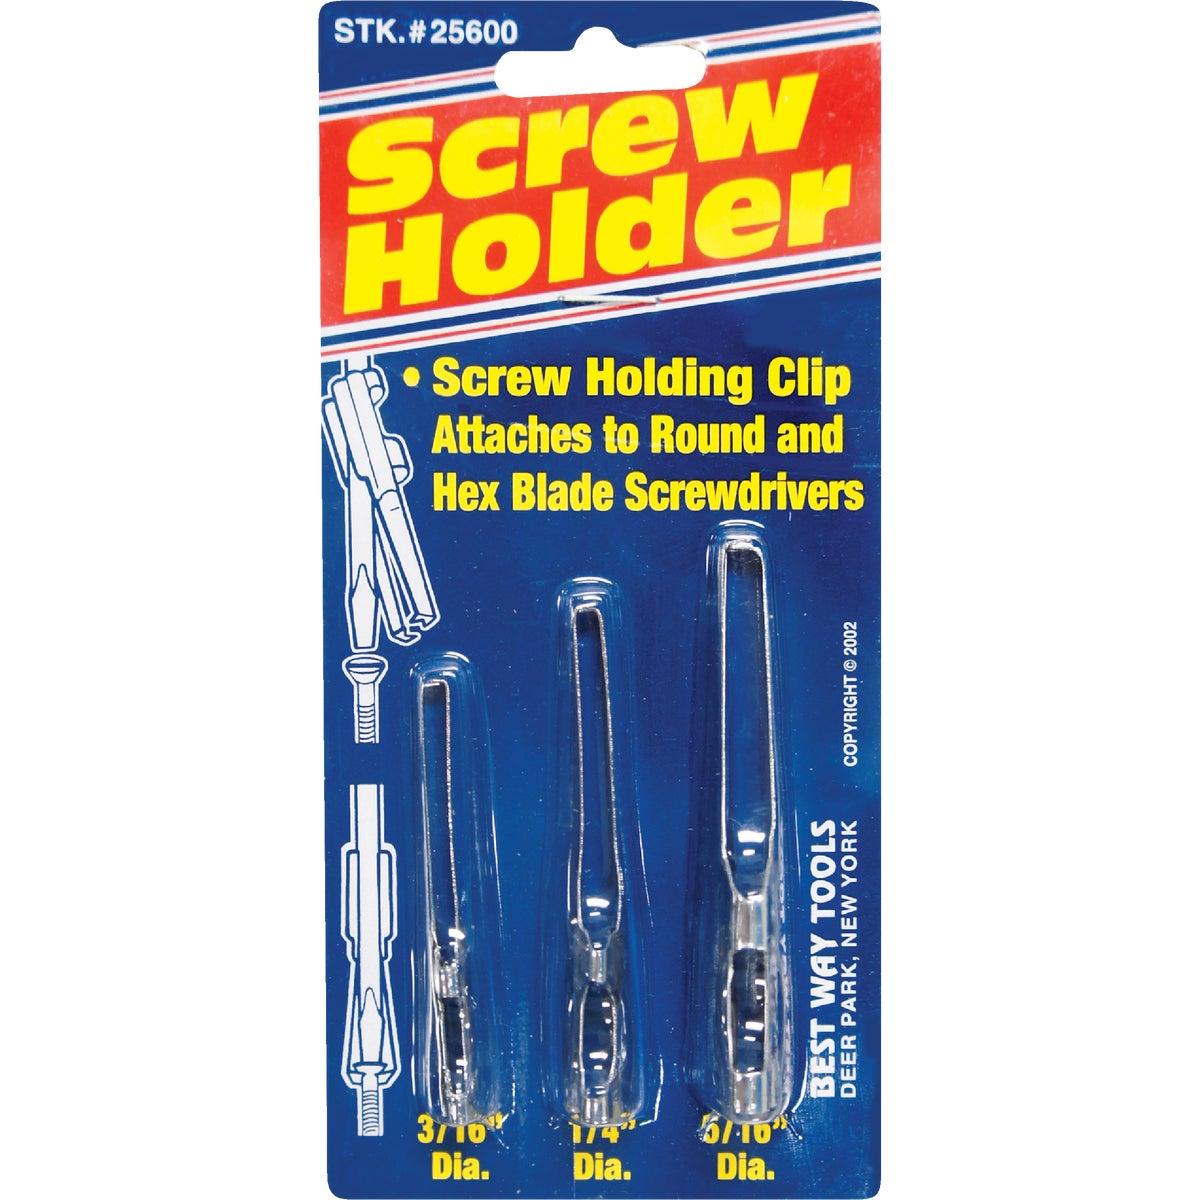 SCREW HOLDER